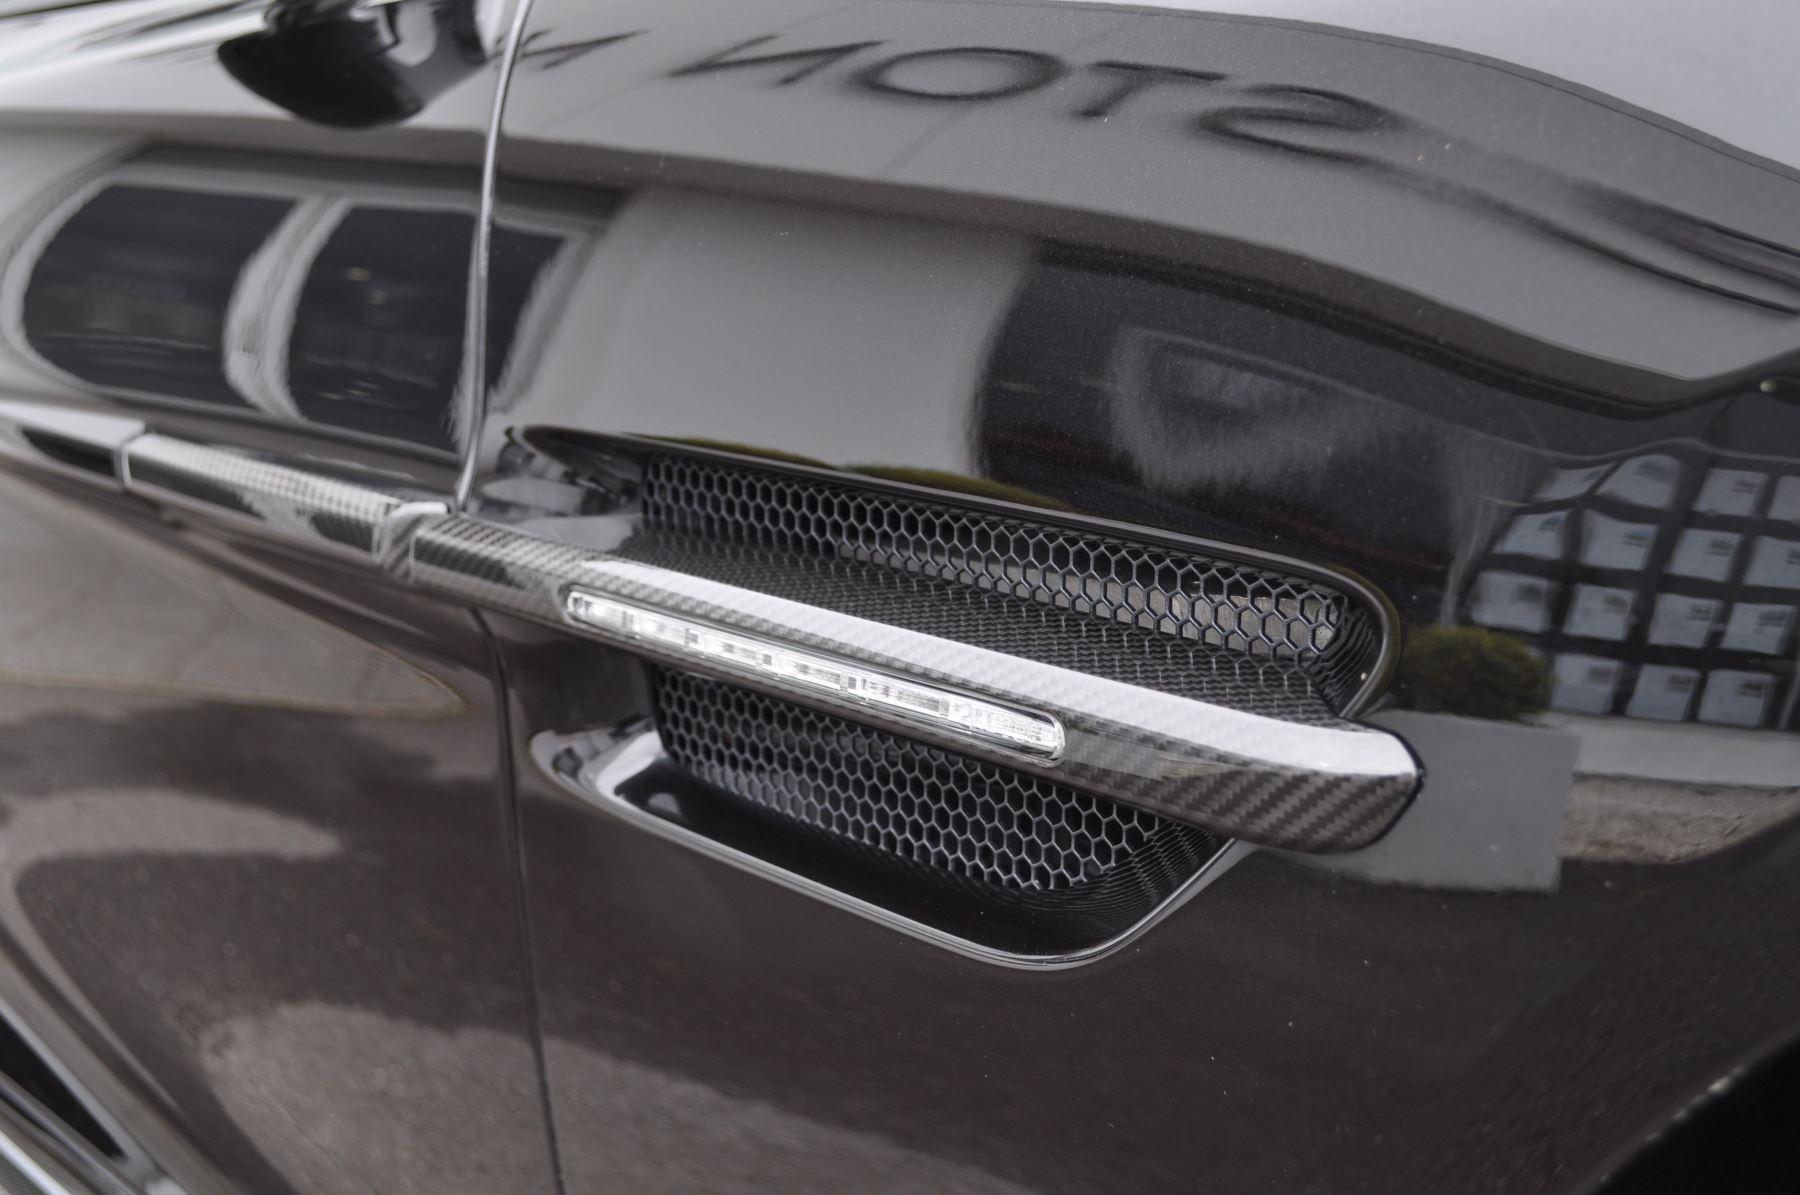 Aston Martin Vanquish S V12 [595] S 2+2 2dr Touchtronic image 19